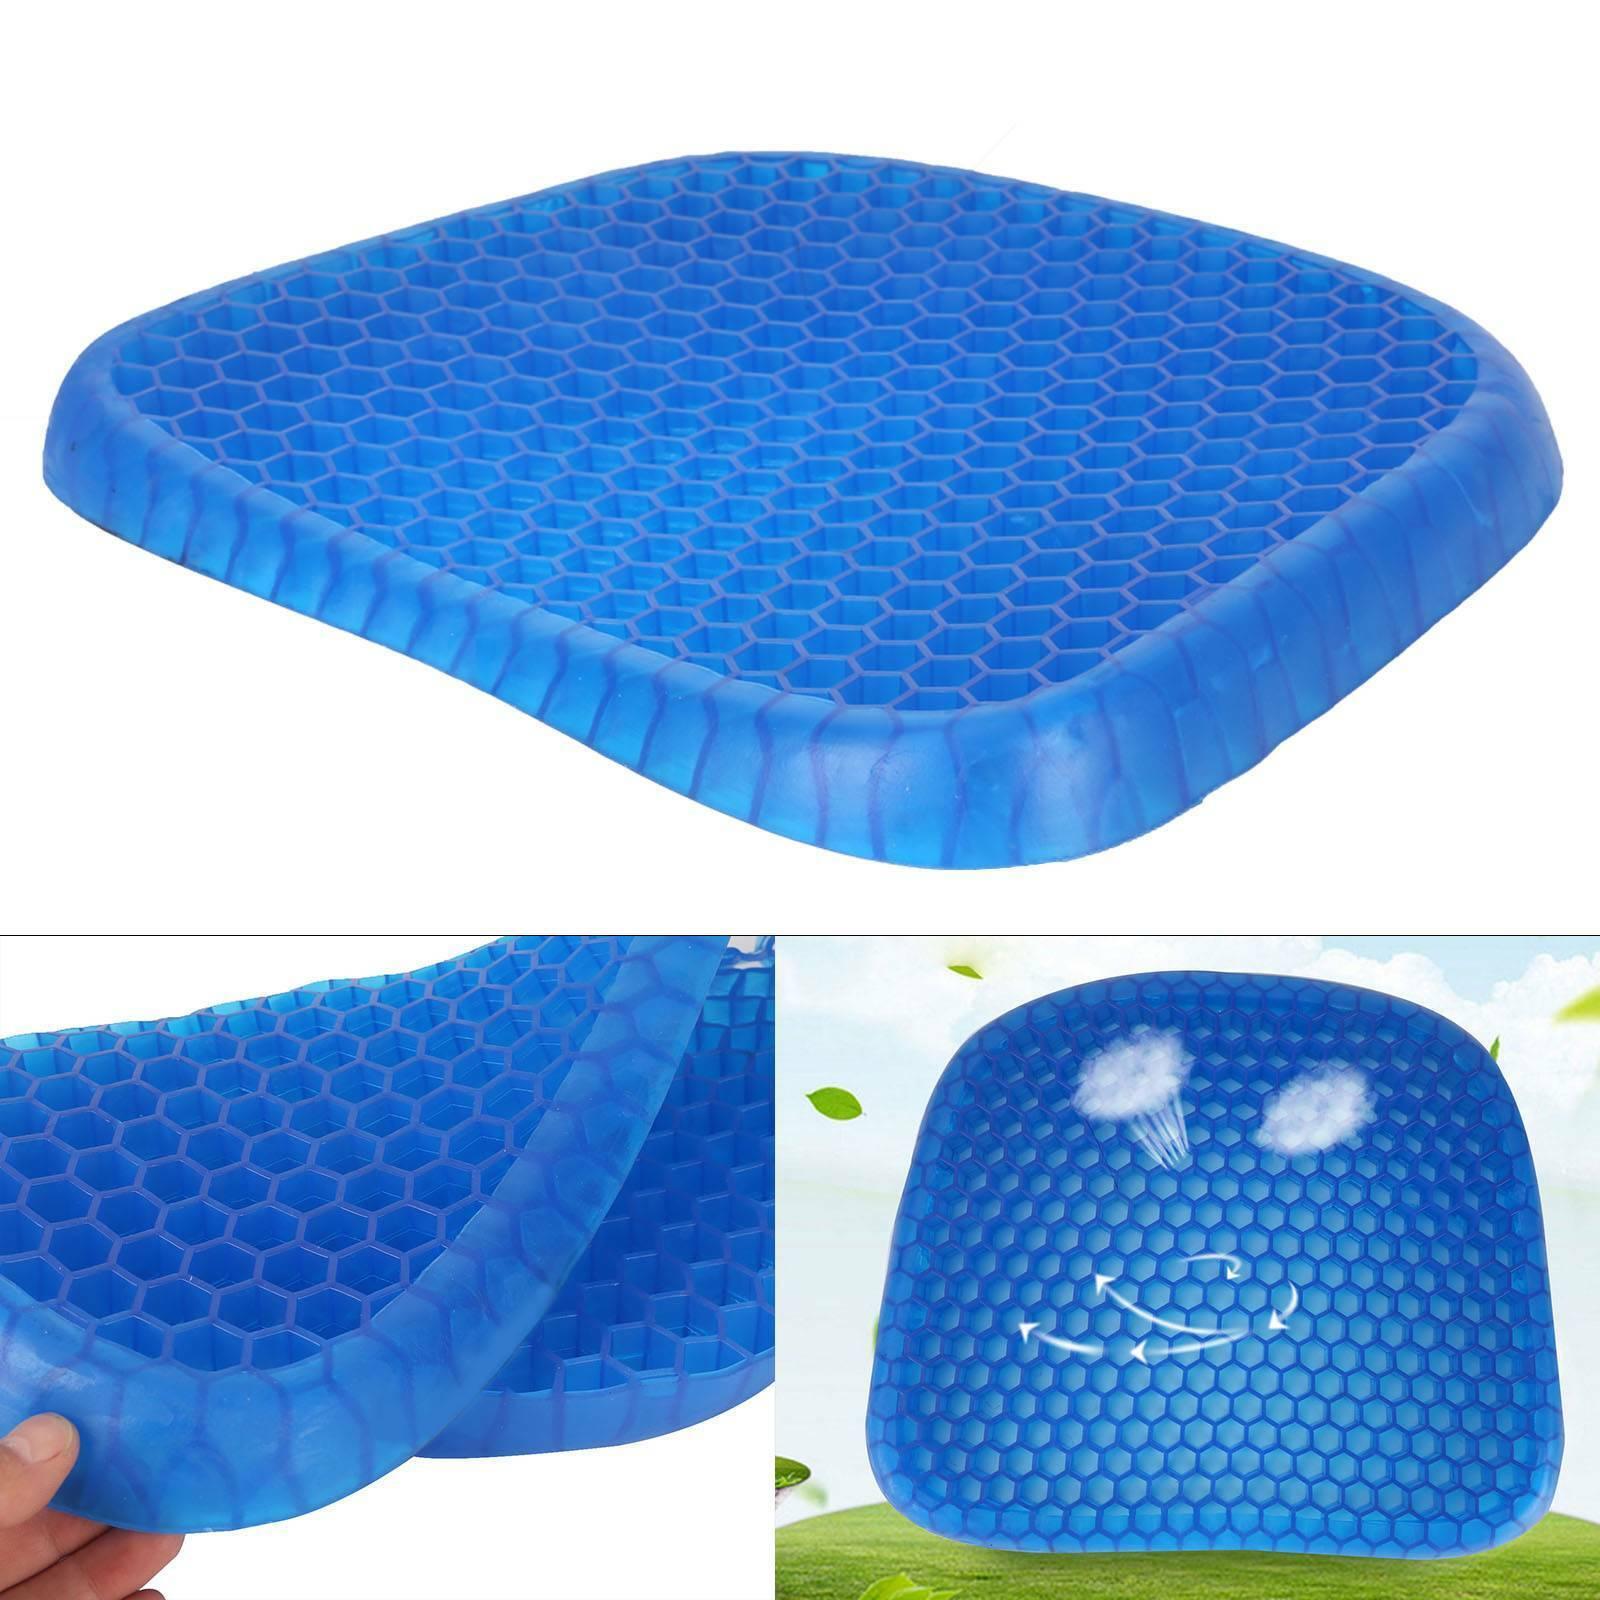 Image 1 - Comfortable-Egg-Sitting-Gel-Flex-Cushion-Seat-Sitter-Flex-Pillow-Back-Support